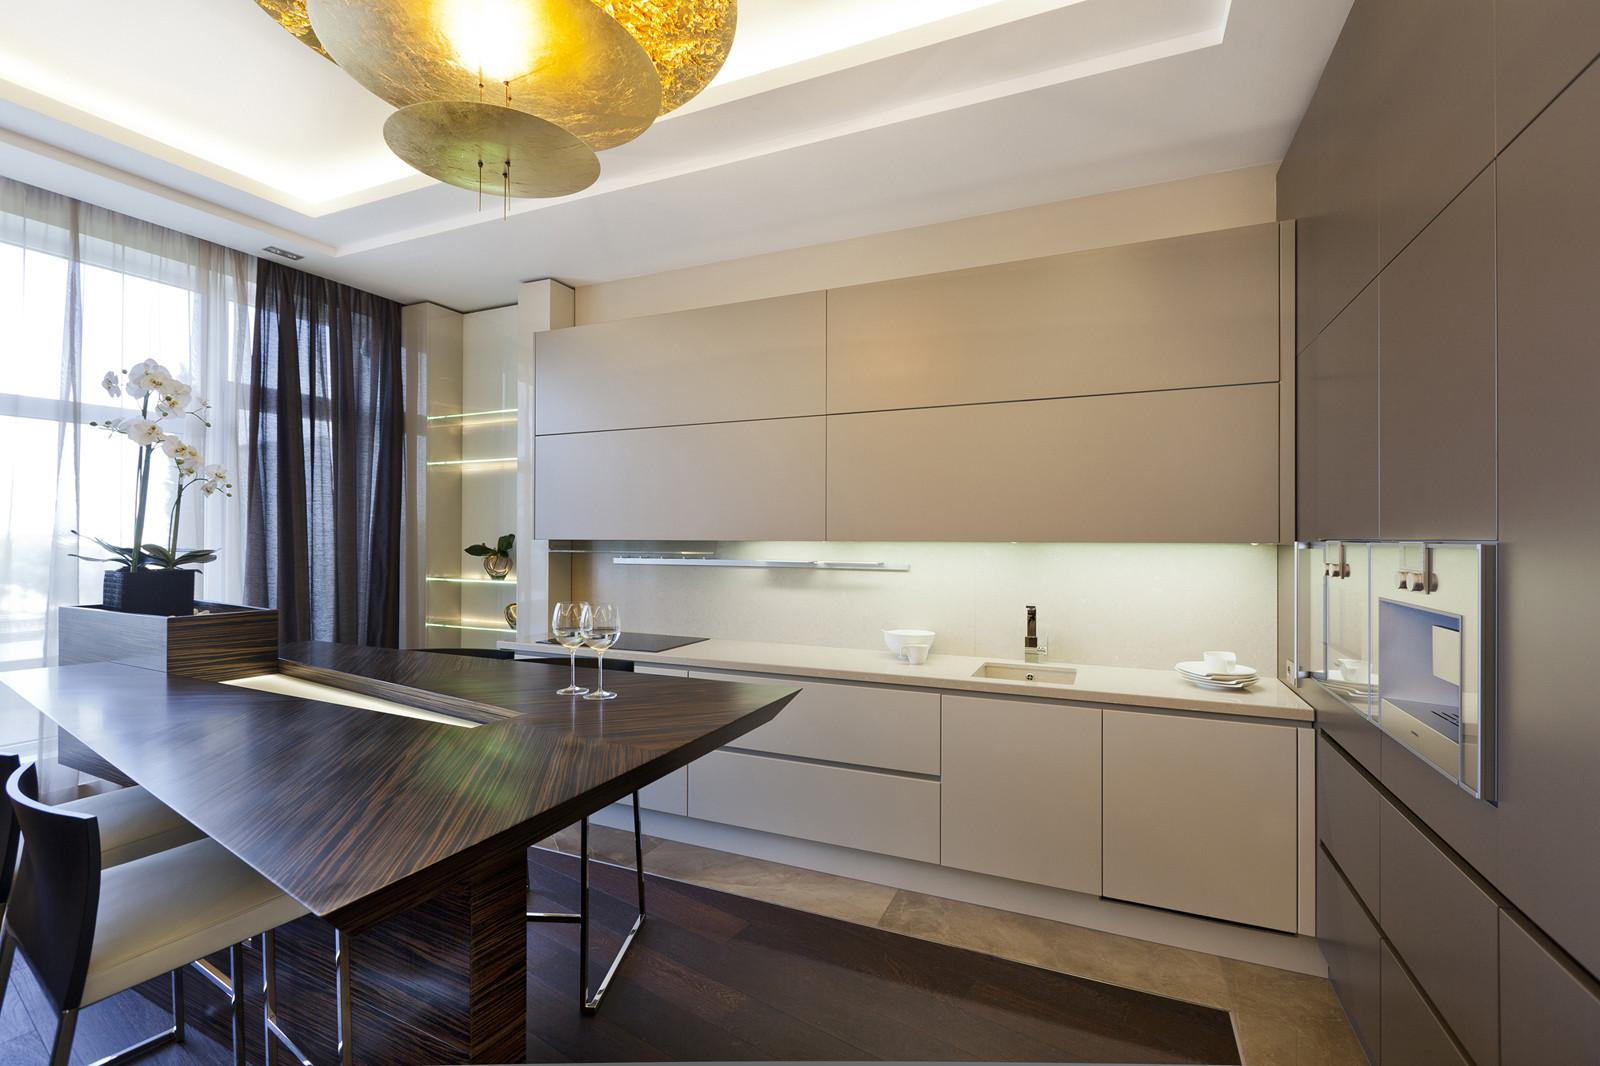 Кухня студия дизайн бежевая